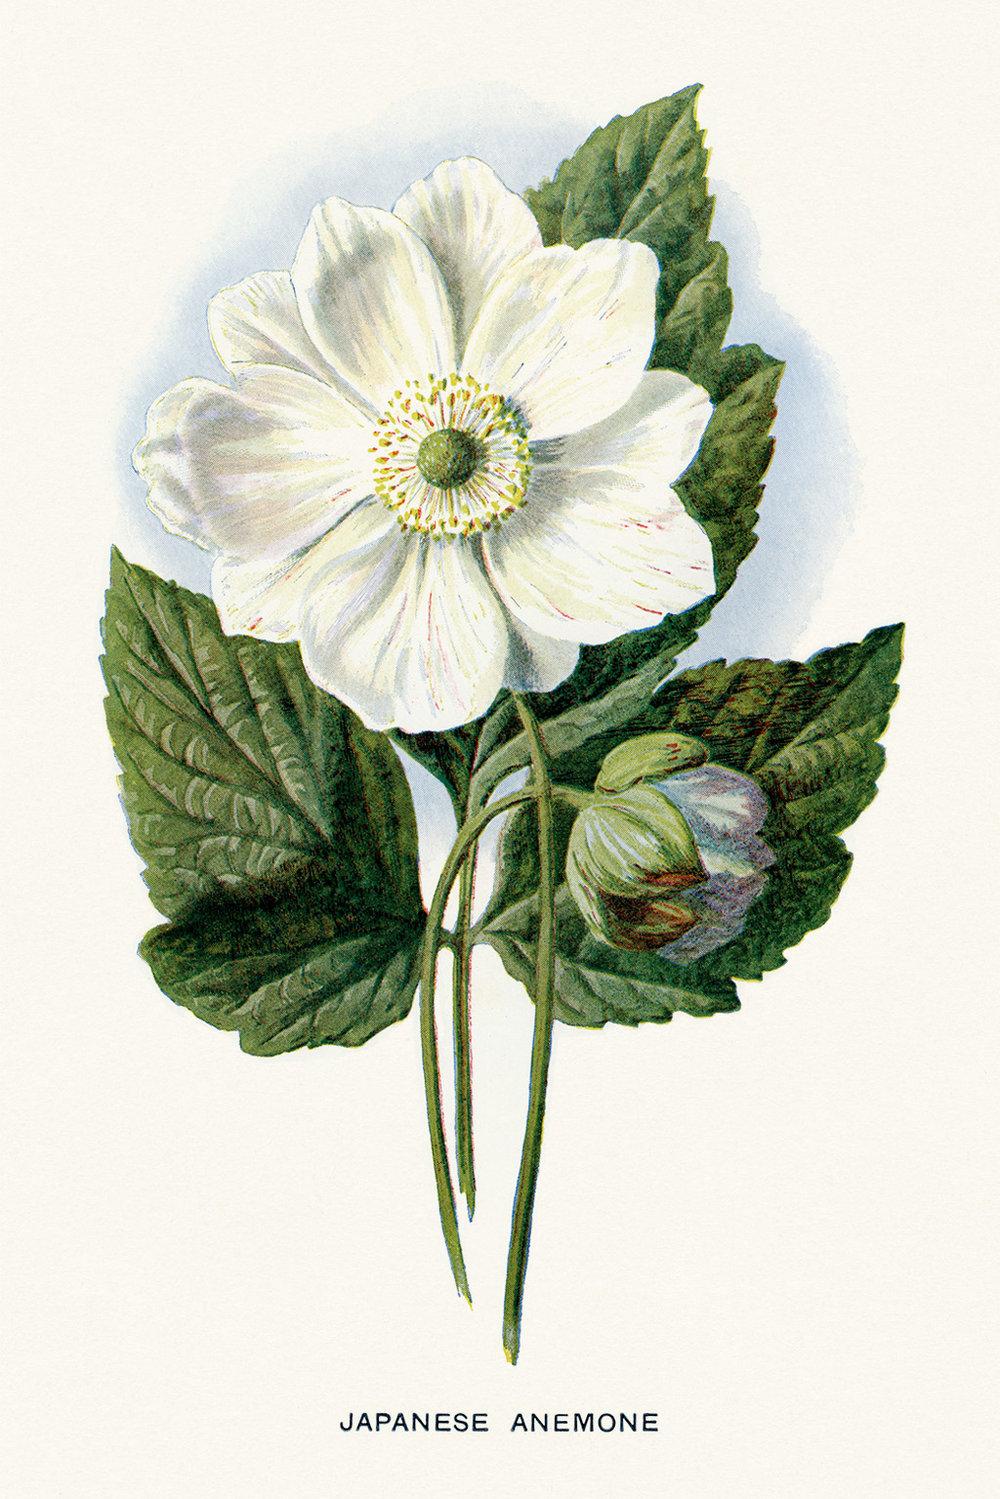 Ephemera-Gardening-Flower-Japanese-Anemone-OldDesignShop.jpg